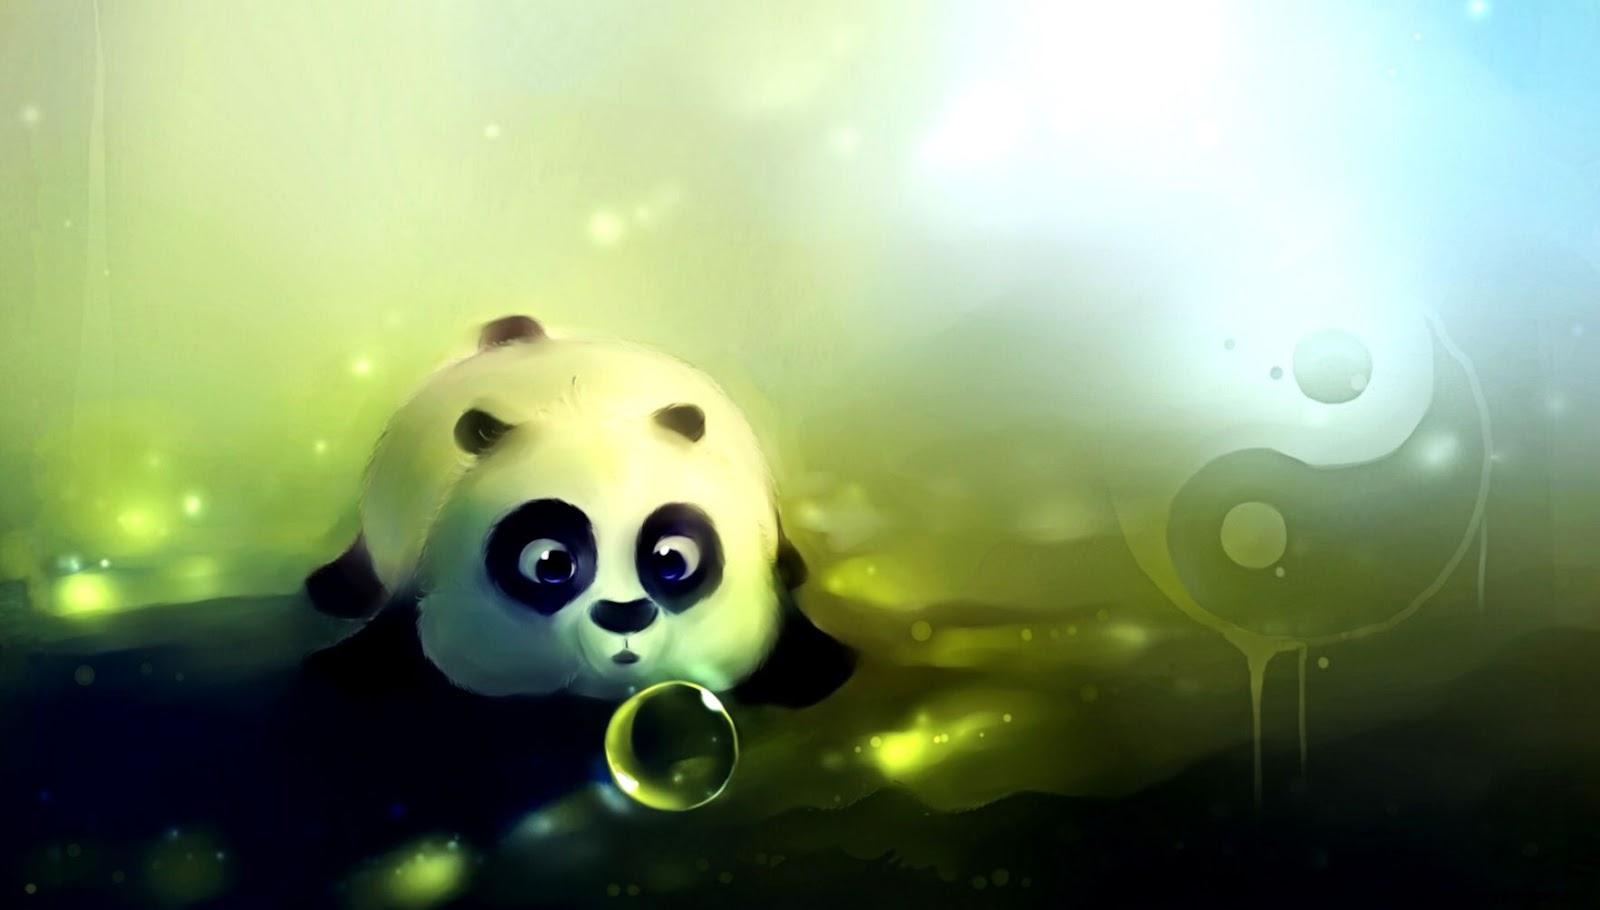 Cute anime panda wallpaper wallpapers gallery - Panda anime wallpaper ...